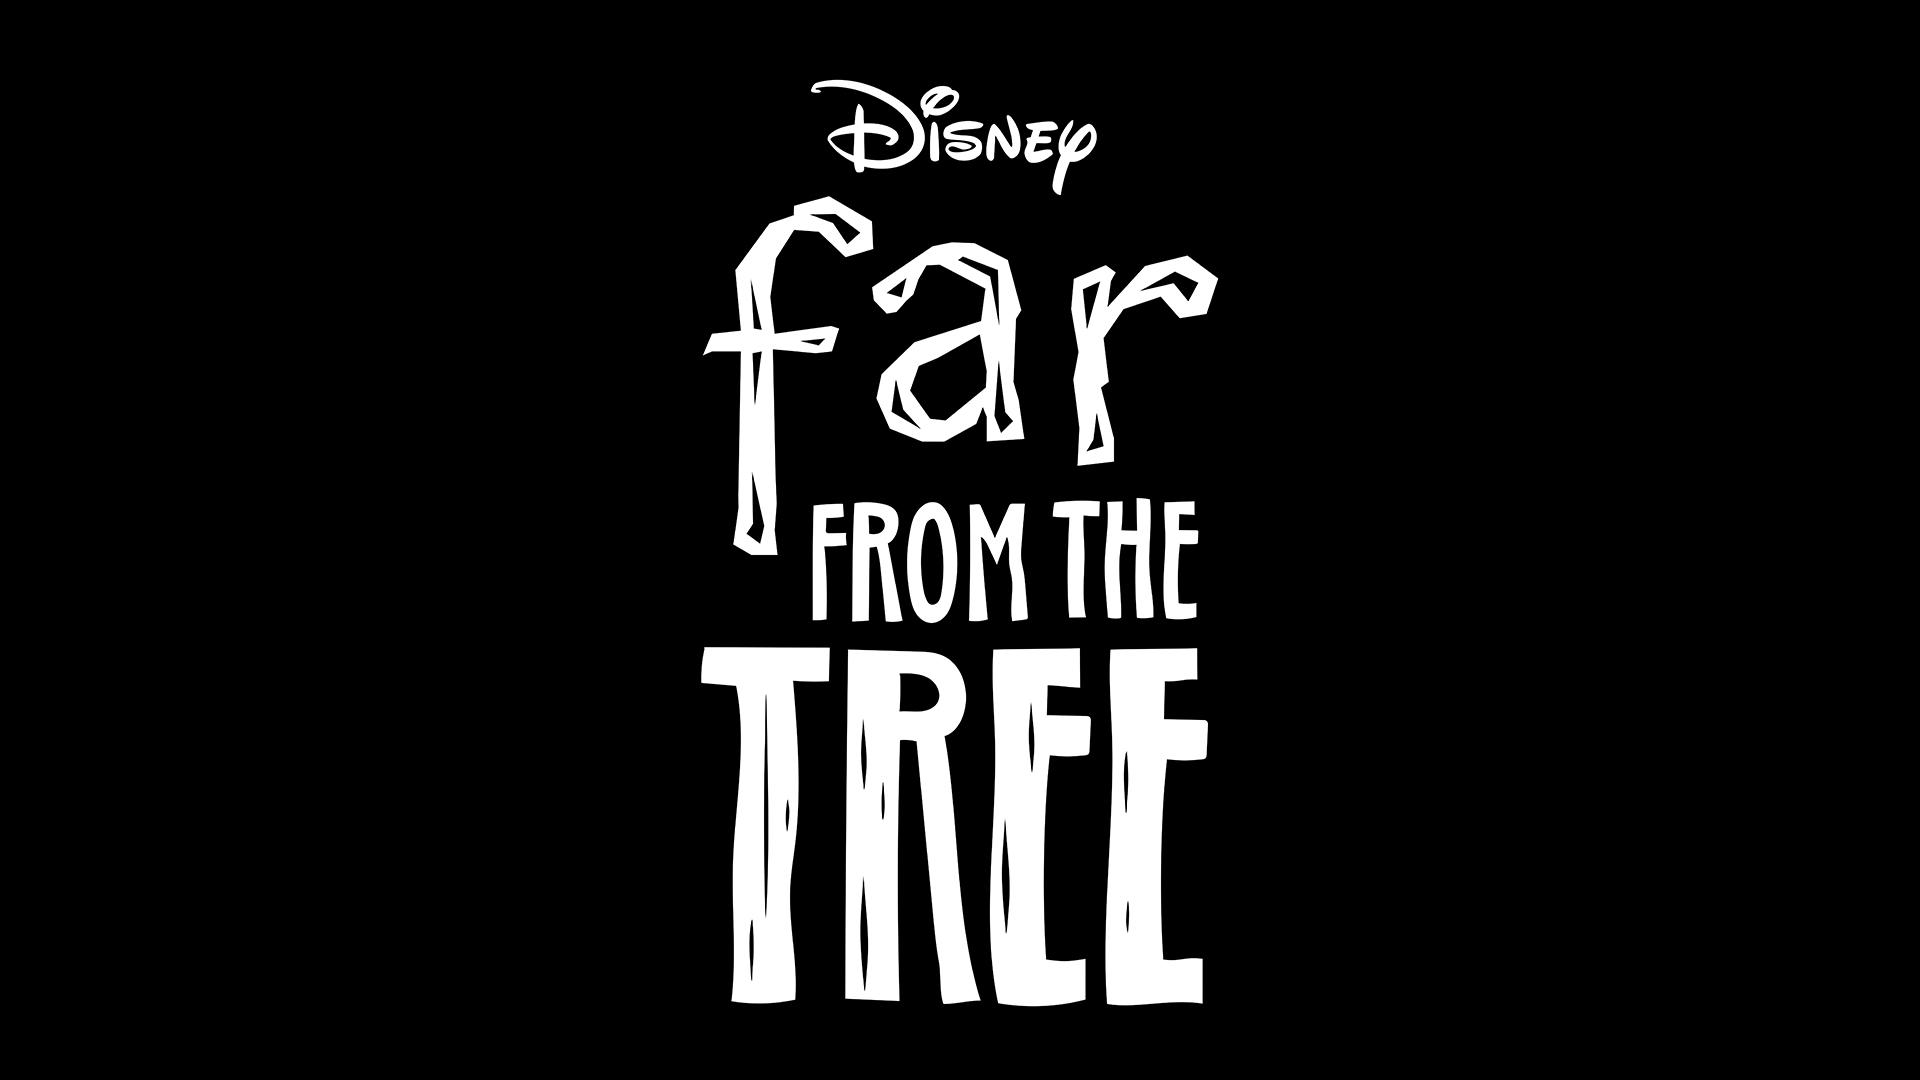 Far From The Tree [Cartoon Walt Disney - 2021]  E12RhxoVUAIoGaJ?format=jpg&name=large